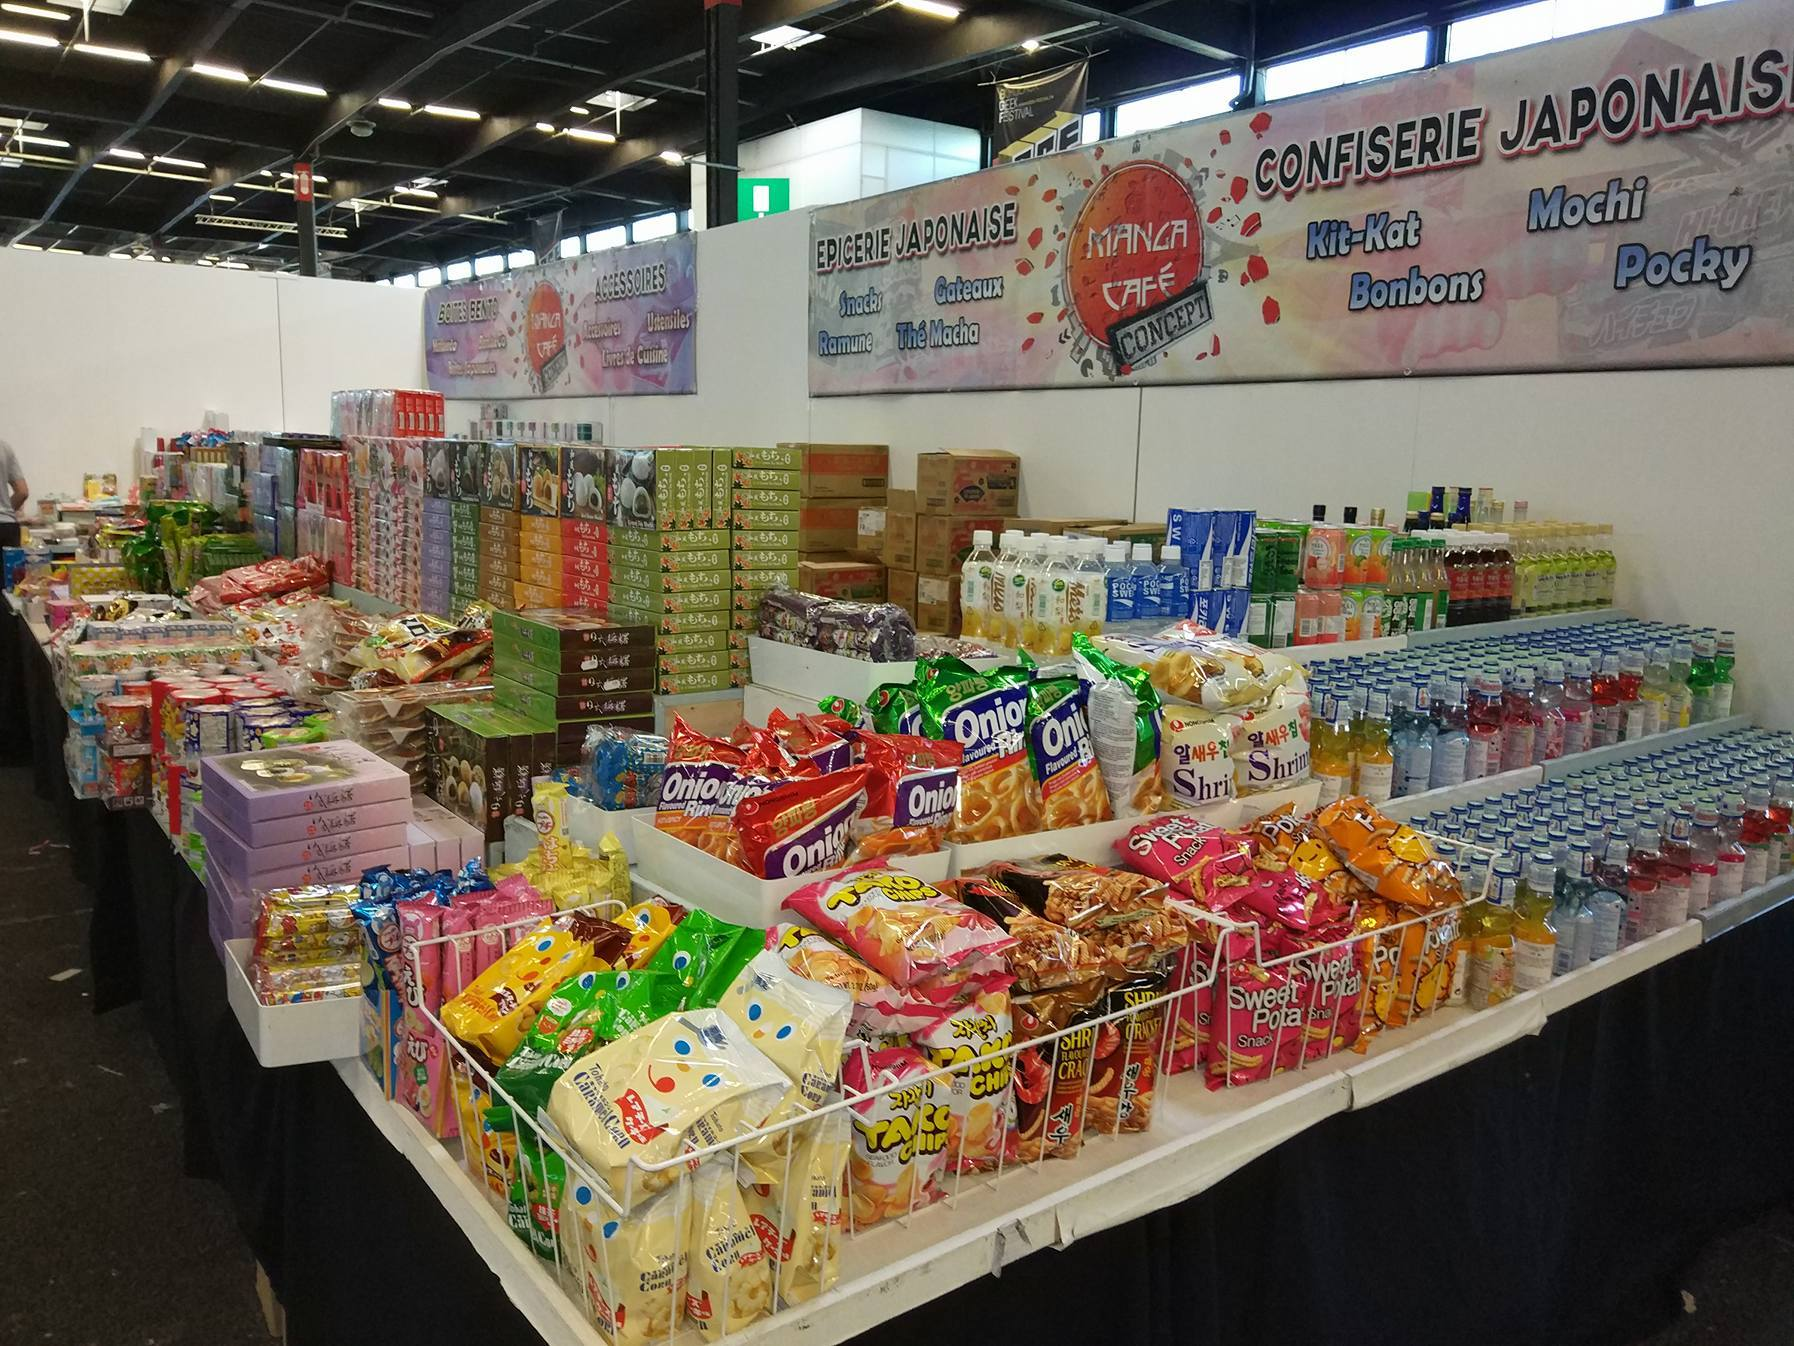 Stand snacks Japonais